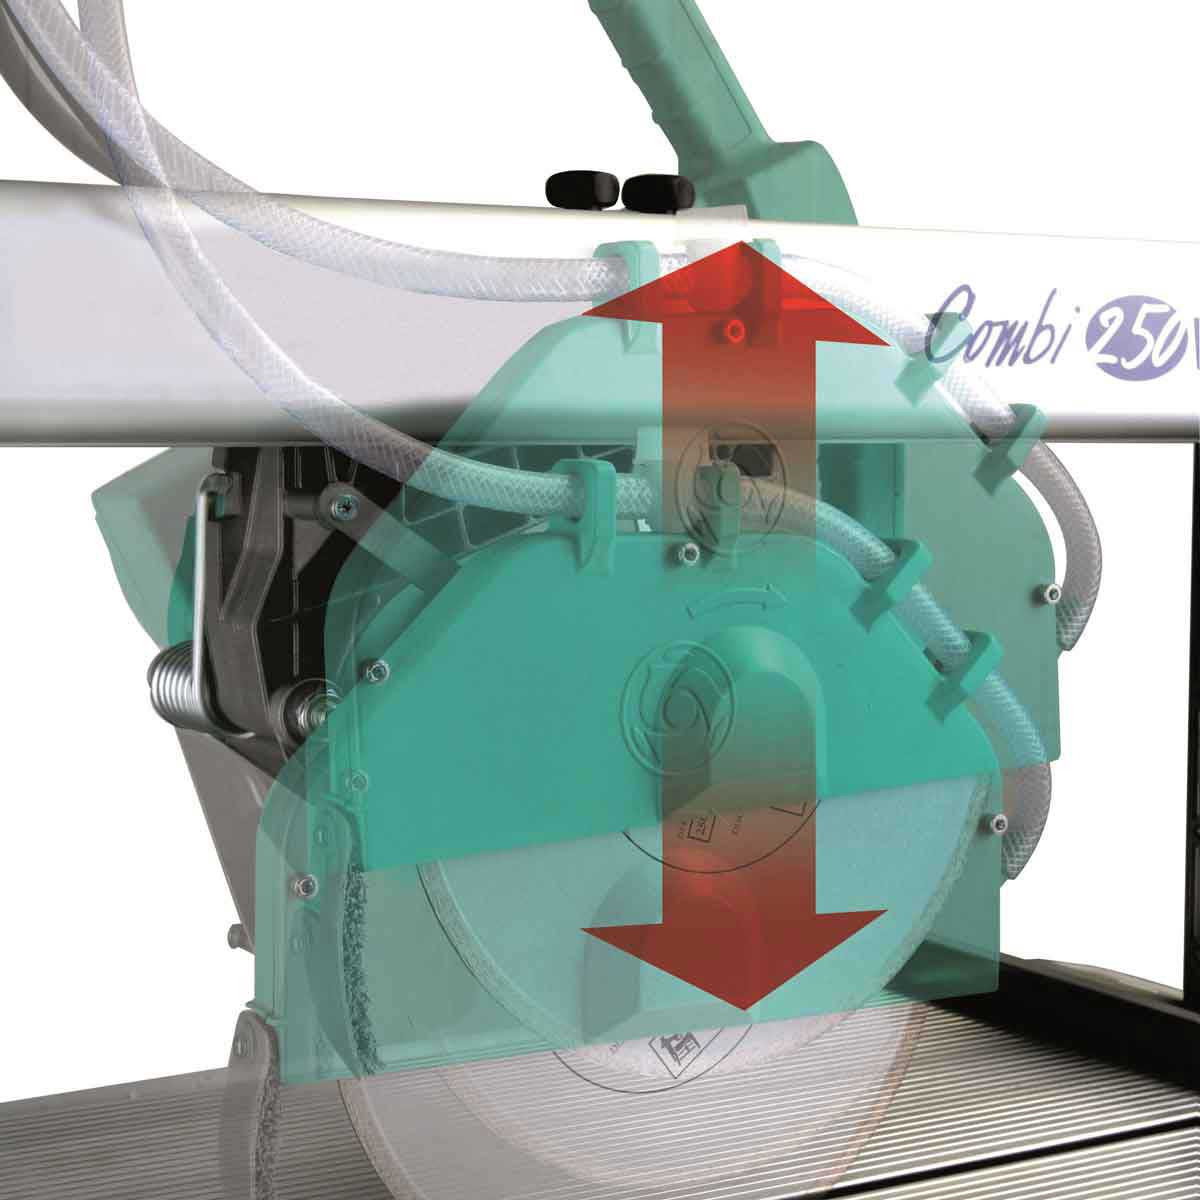 Imer Combi 250VA plunge cut capability